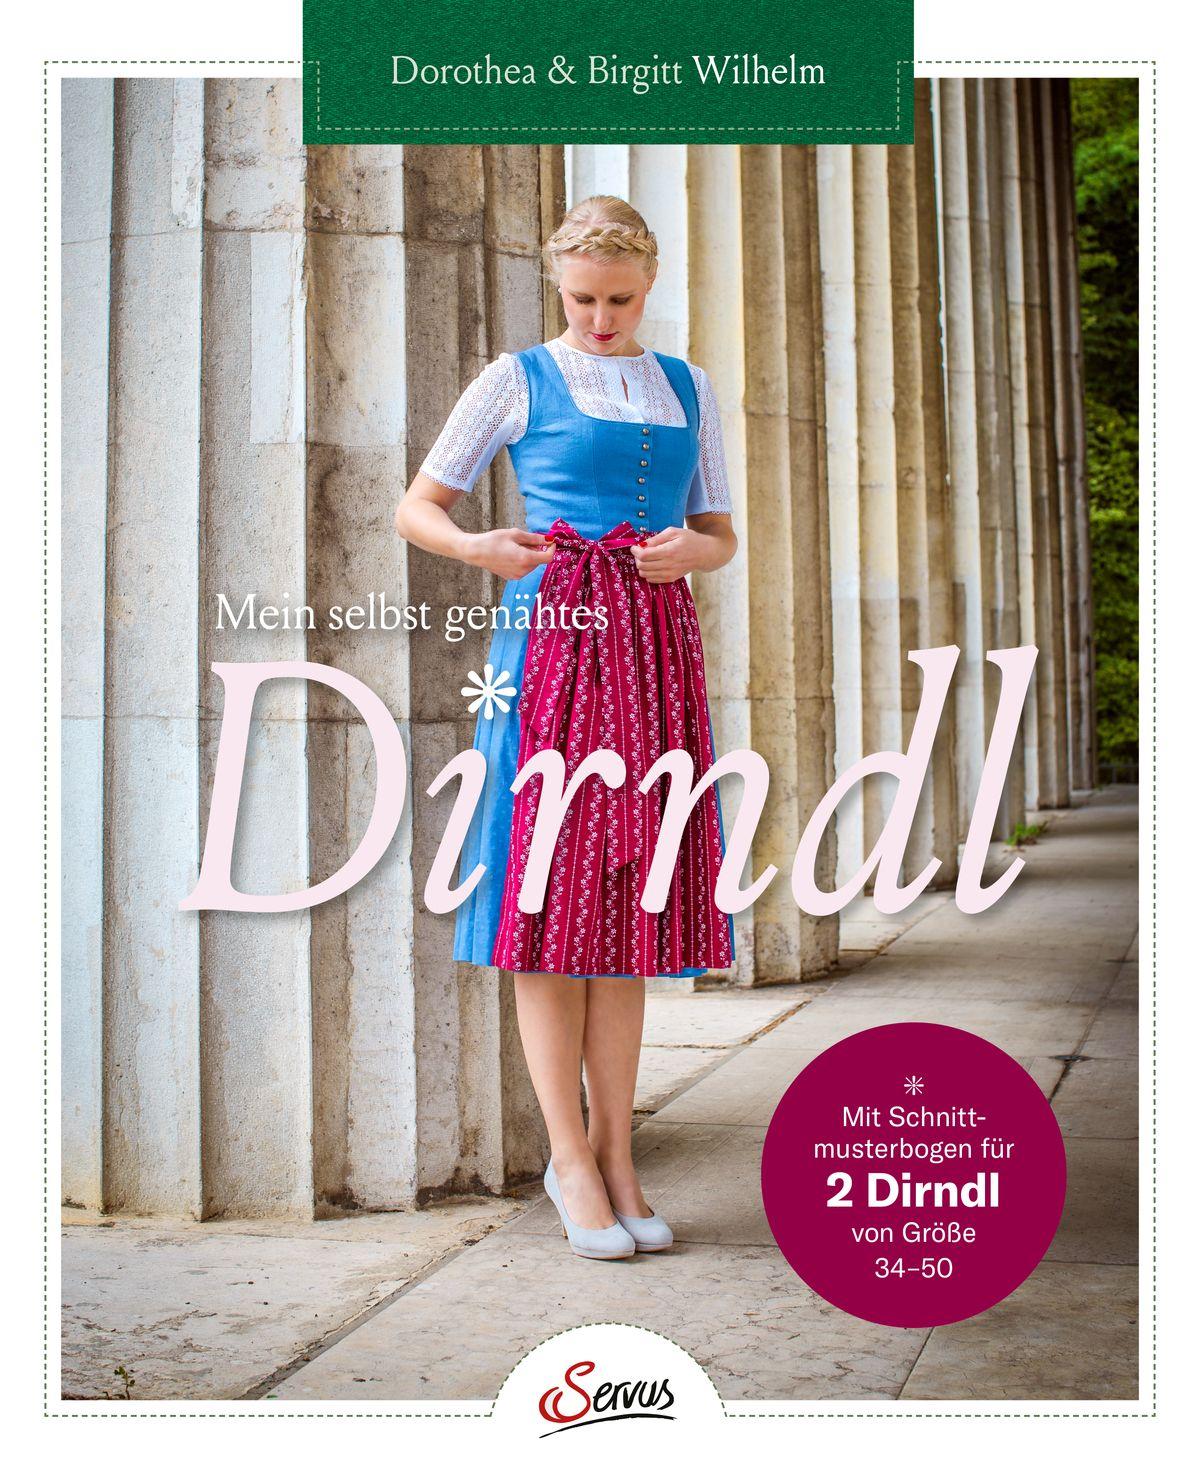 """Mein selbst genähtes Dirndl"", Dorothea & Birgitt Wilhelm Servus, ISBN-13 9783710402197"